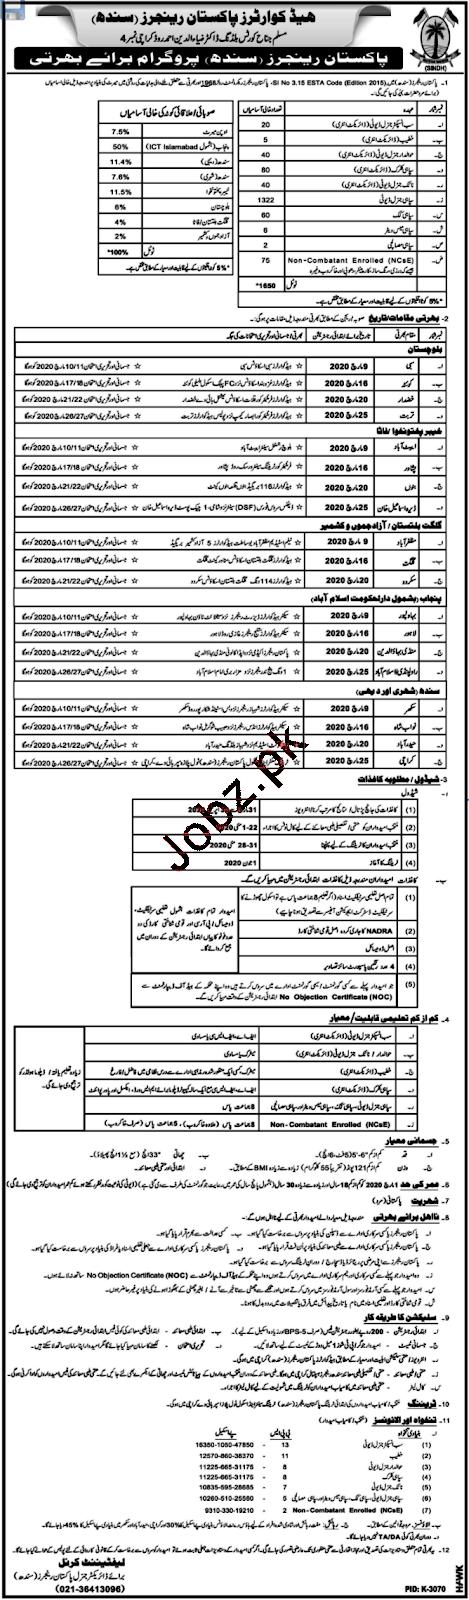 Jobs in Pak Rangers 2020 Latest Advertisement